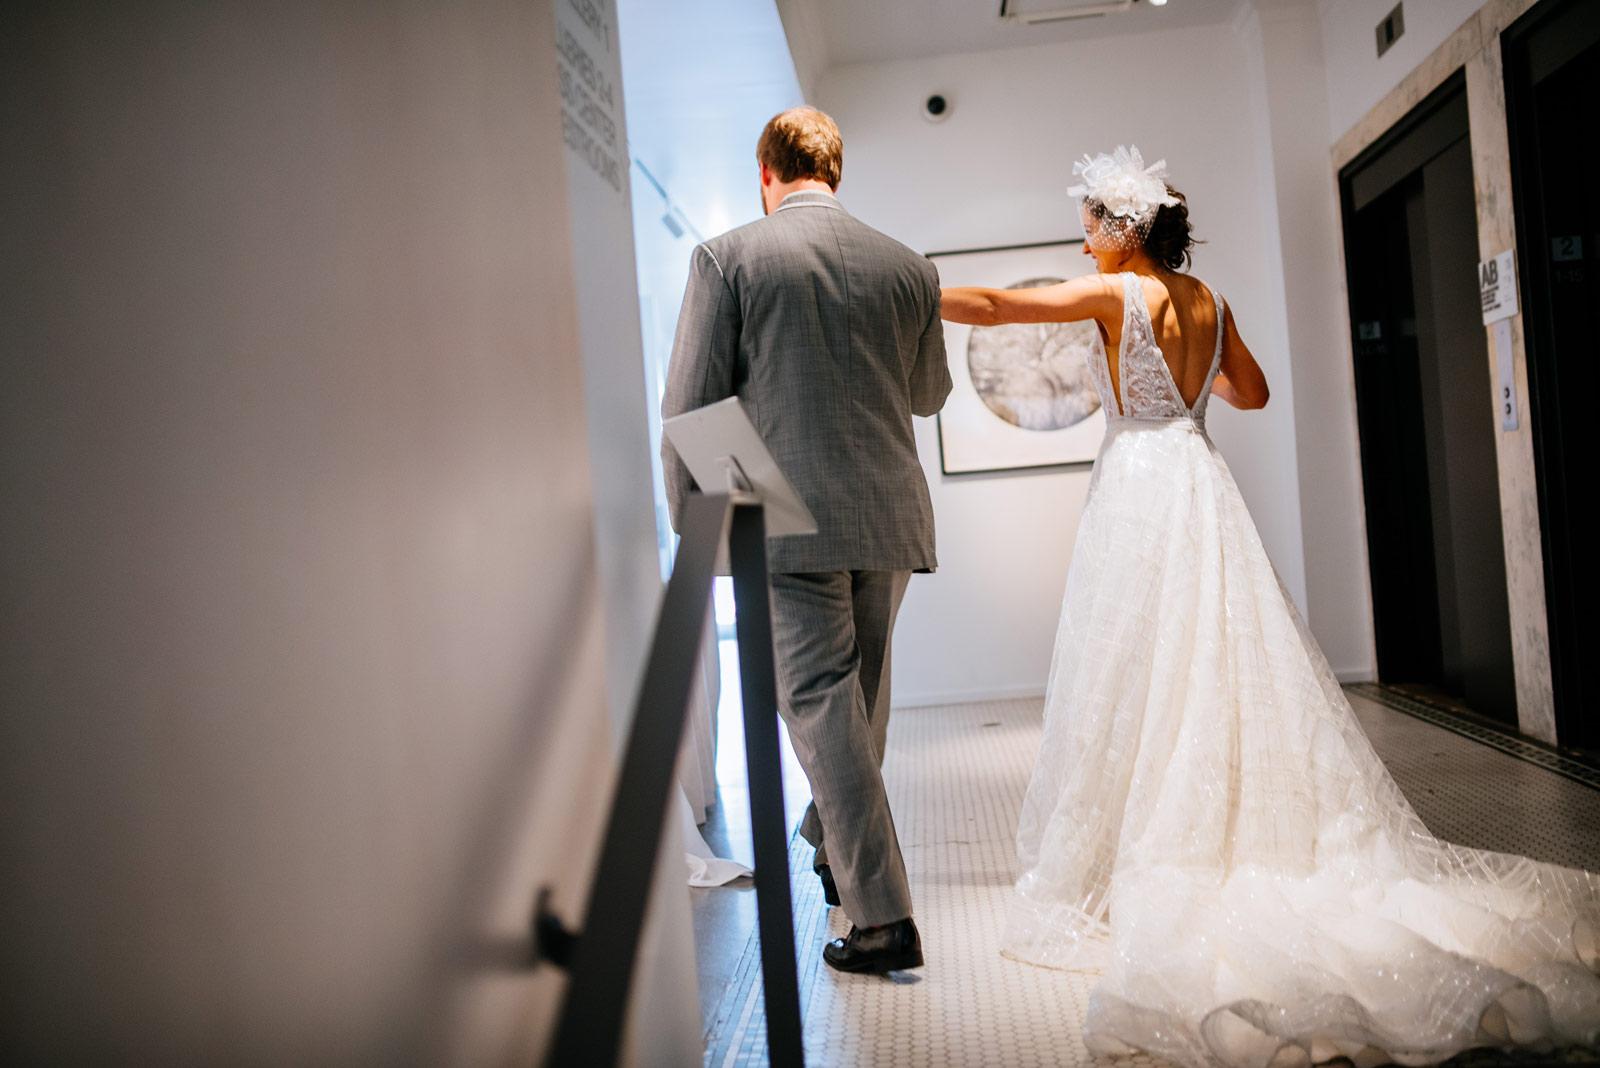 21c museum lexington wedding